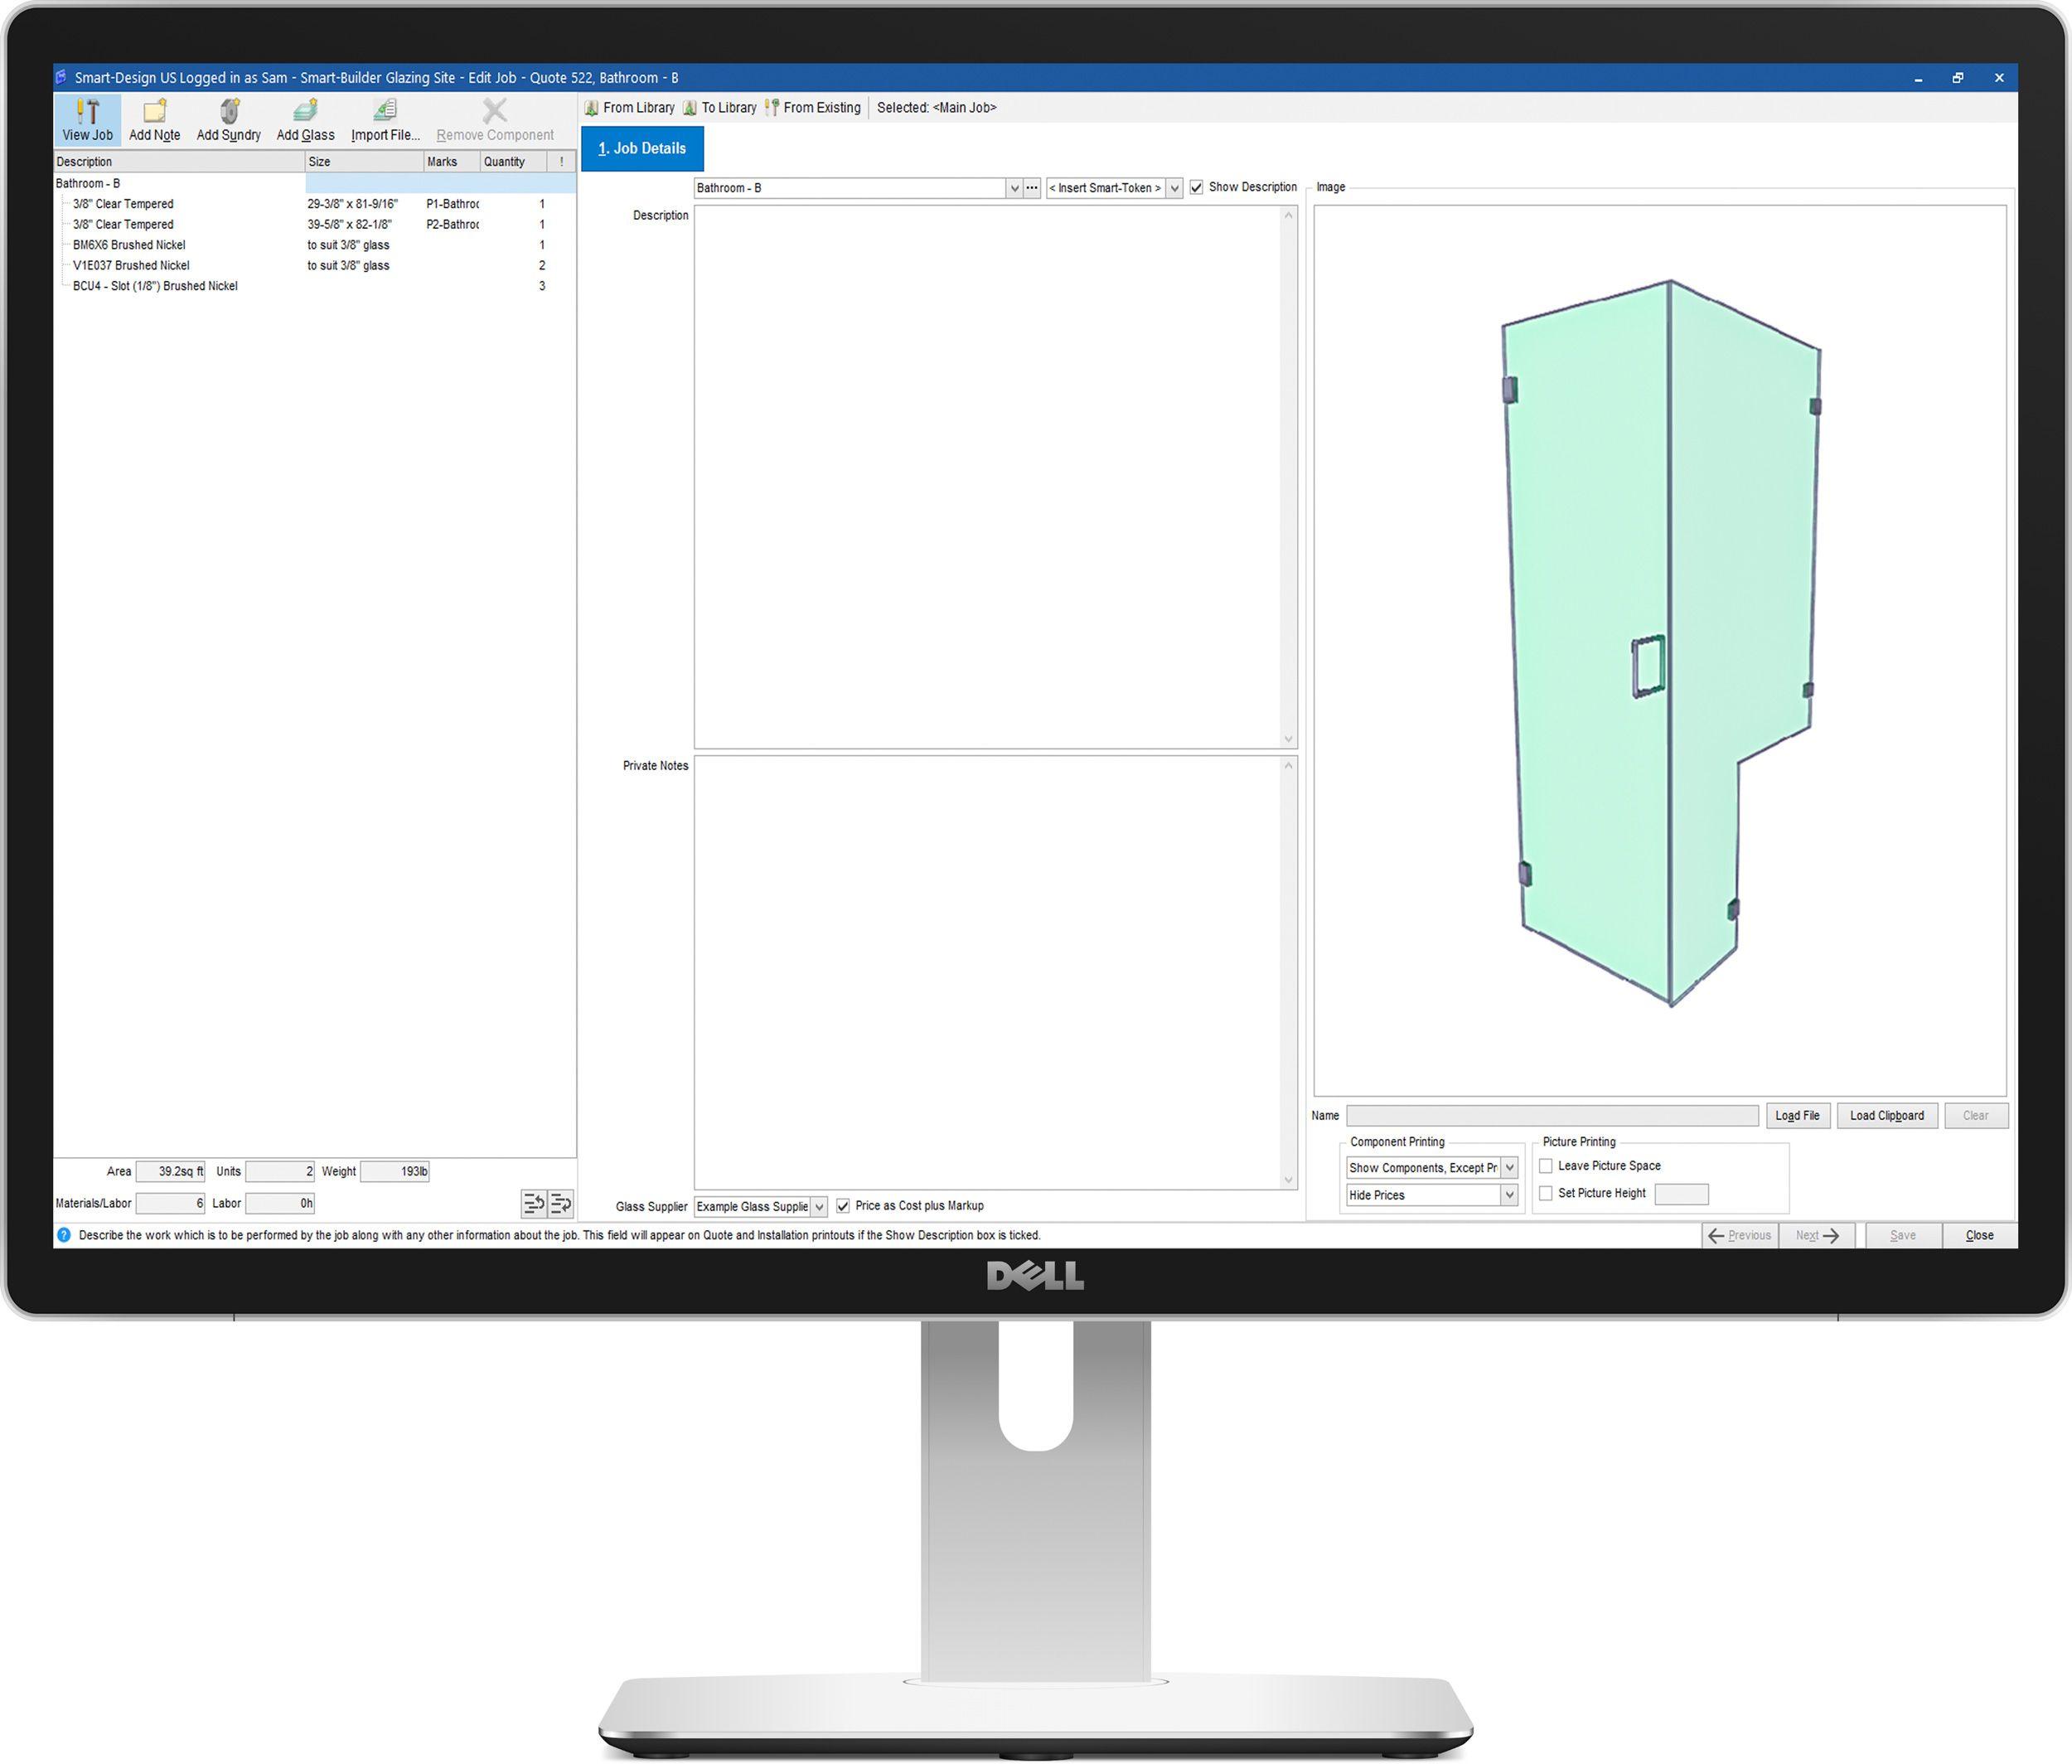 Smart-Glass Enterprise - Import from Showers Online